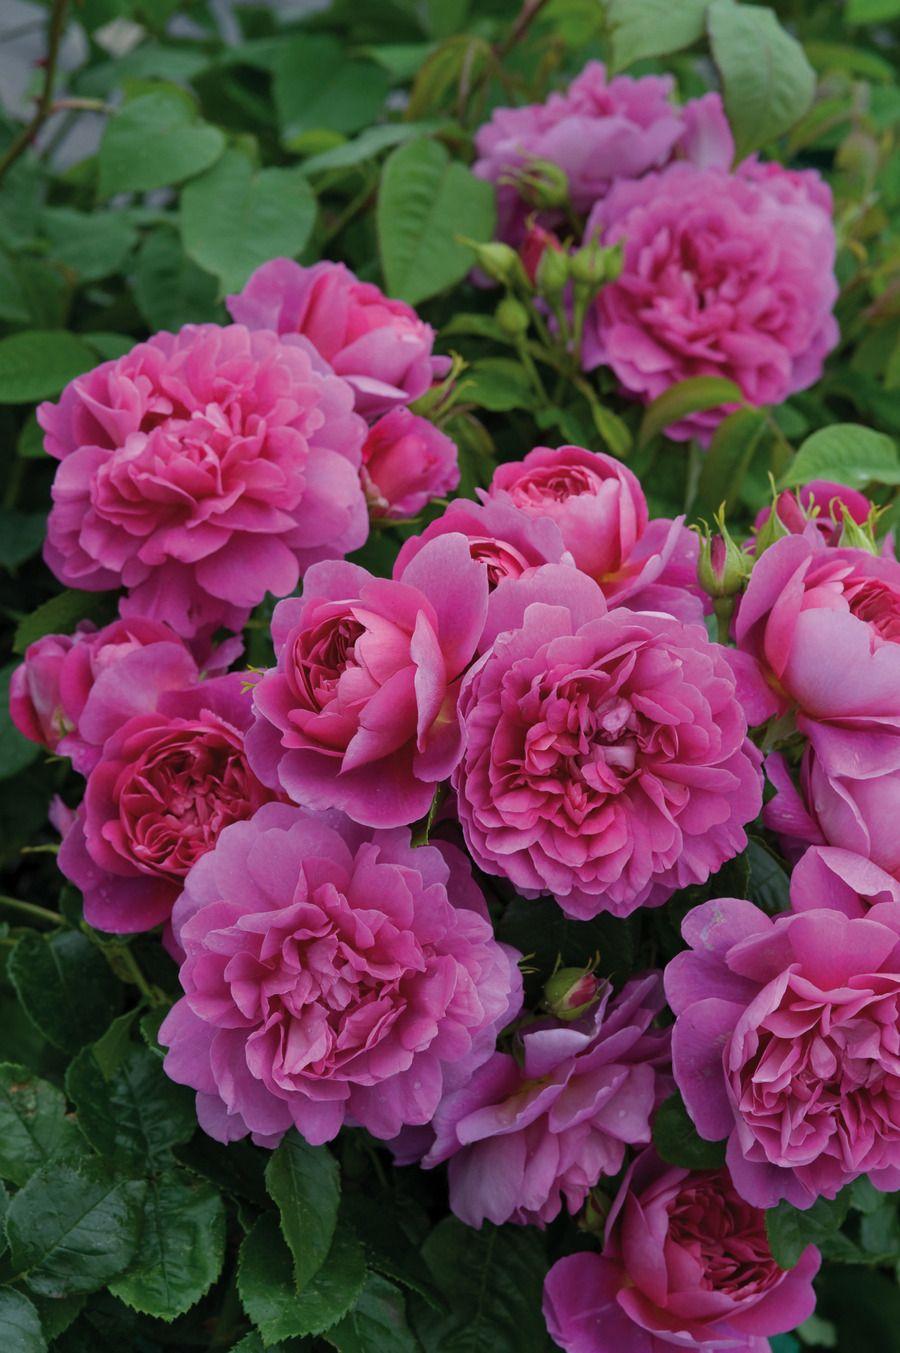 Rosa 'Princes Anne' David Austin Roses 예쁜 꽃, 아름다운 장미